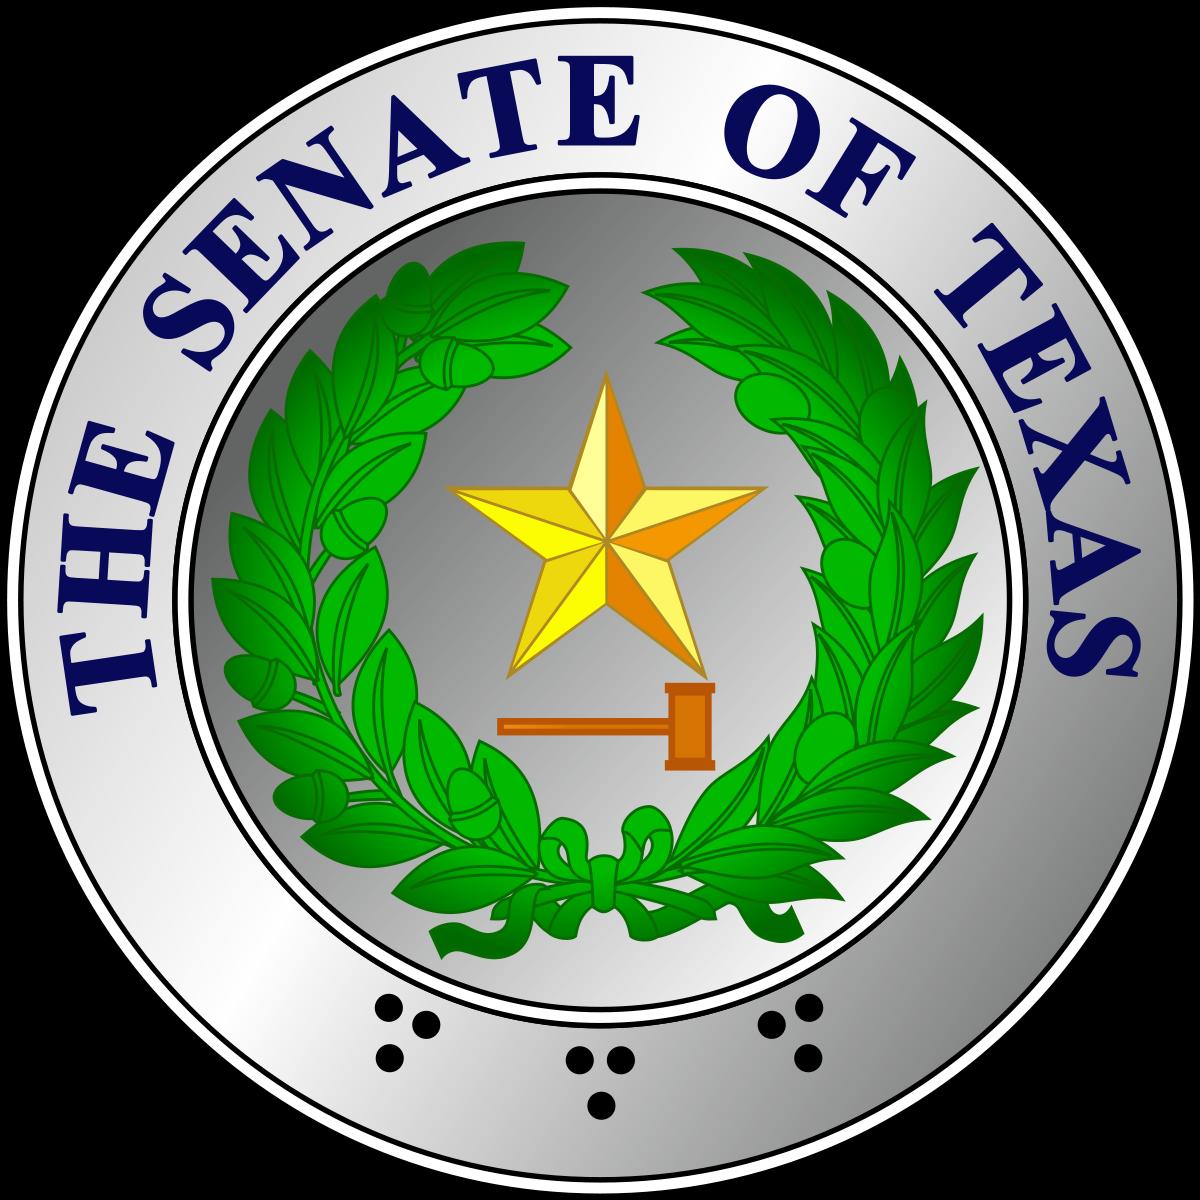 Texas senate wikipedia . Debate clipart congressman